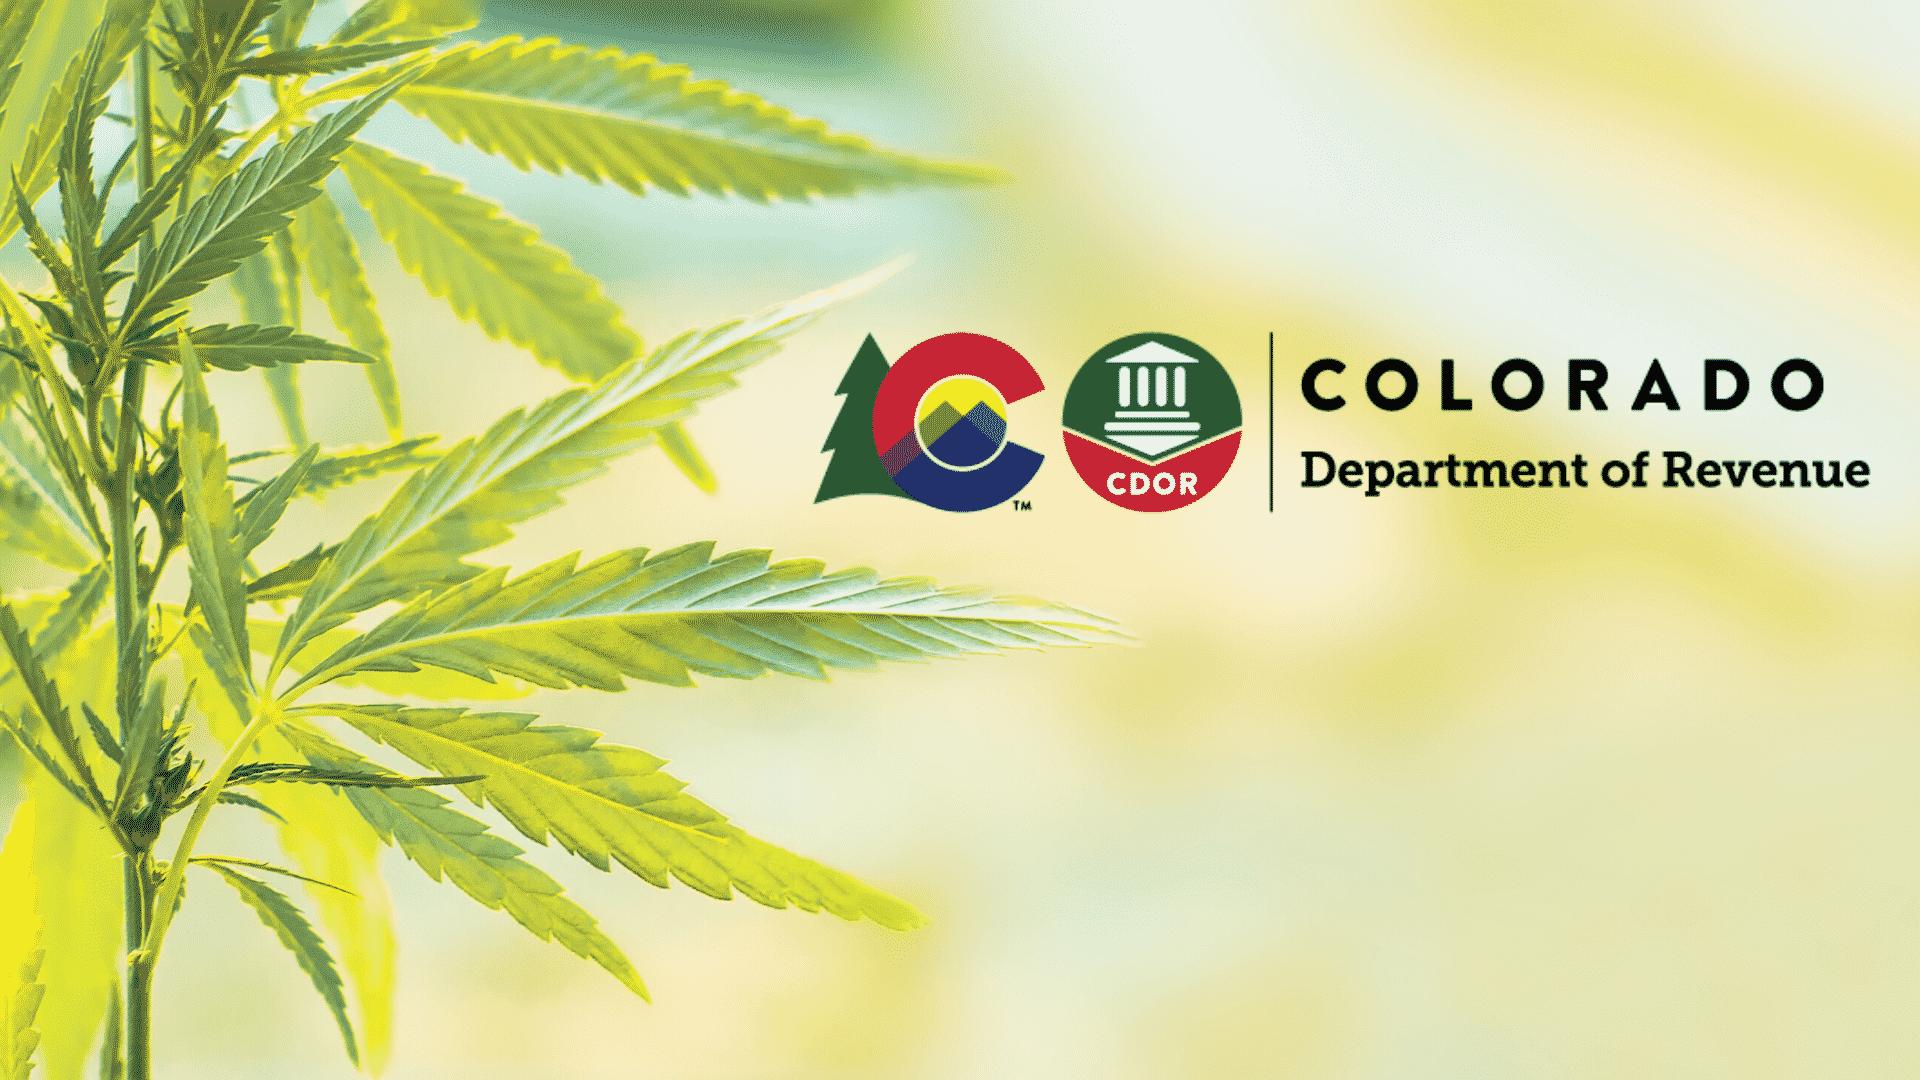 Safety Advisory Issued by Colorado For Possibly Contaminated Marijuana